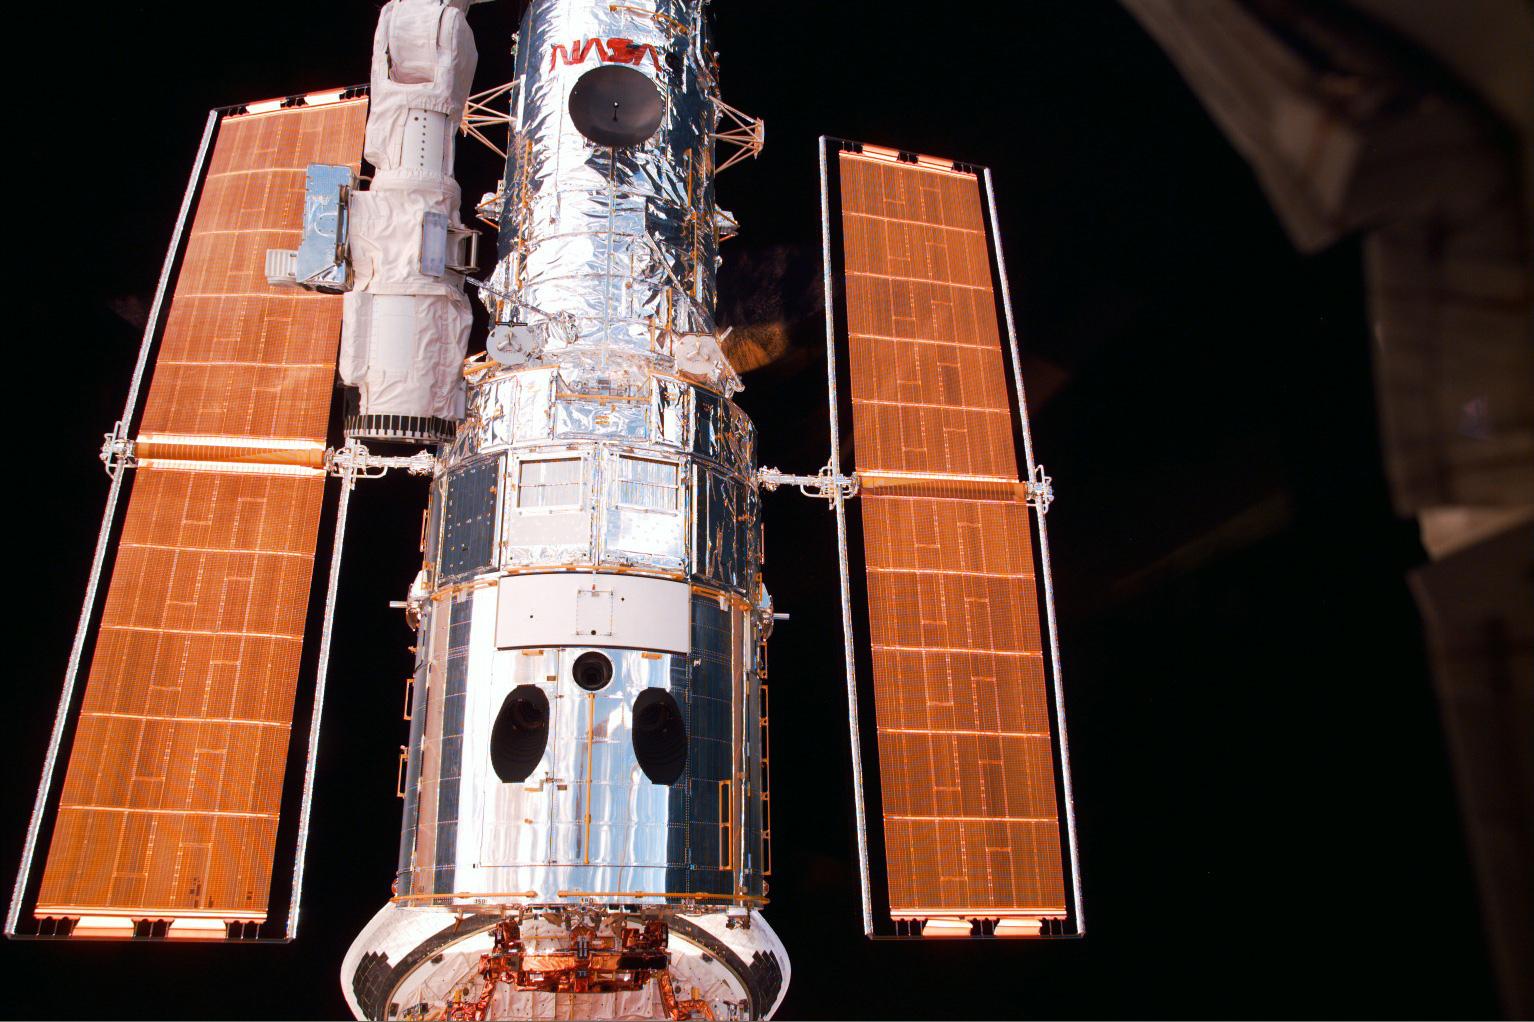 nasa building the hubble space telescope - HD1280×853